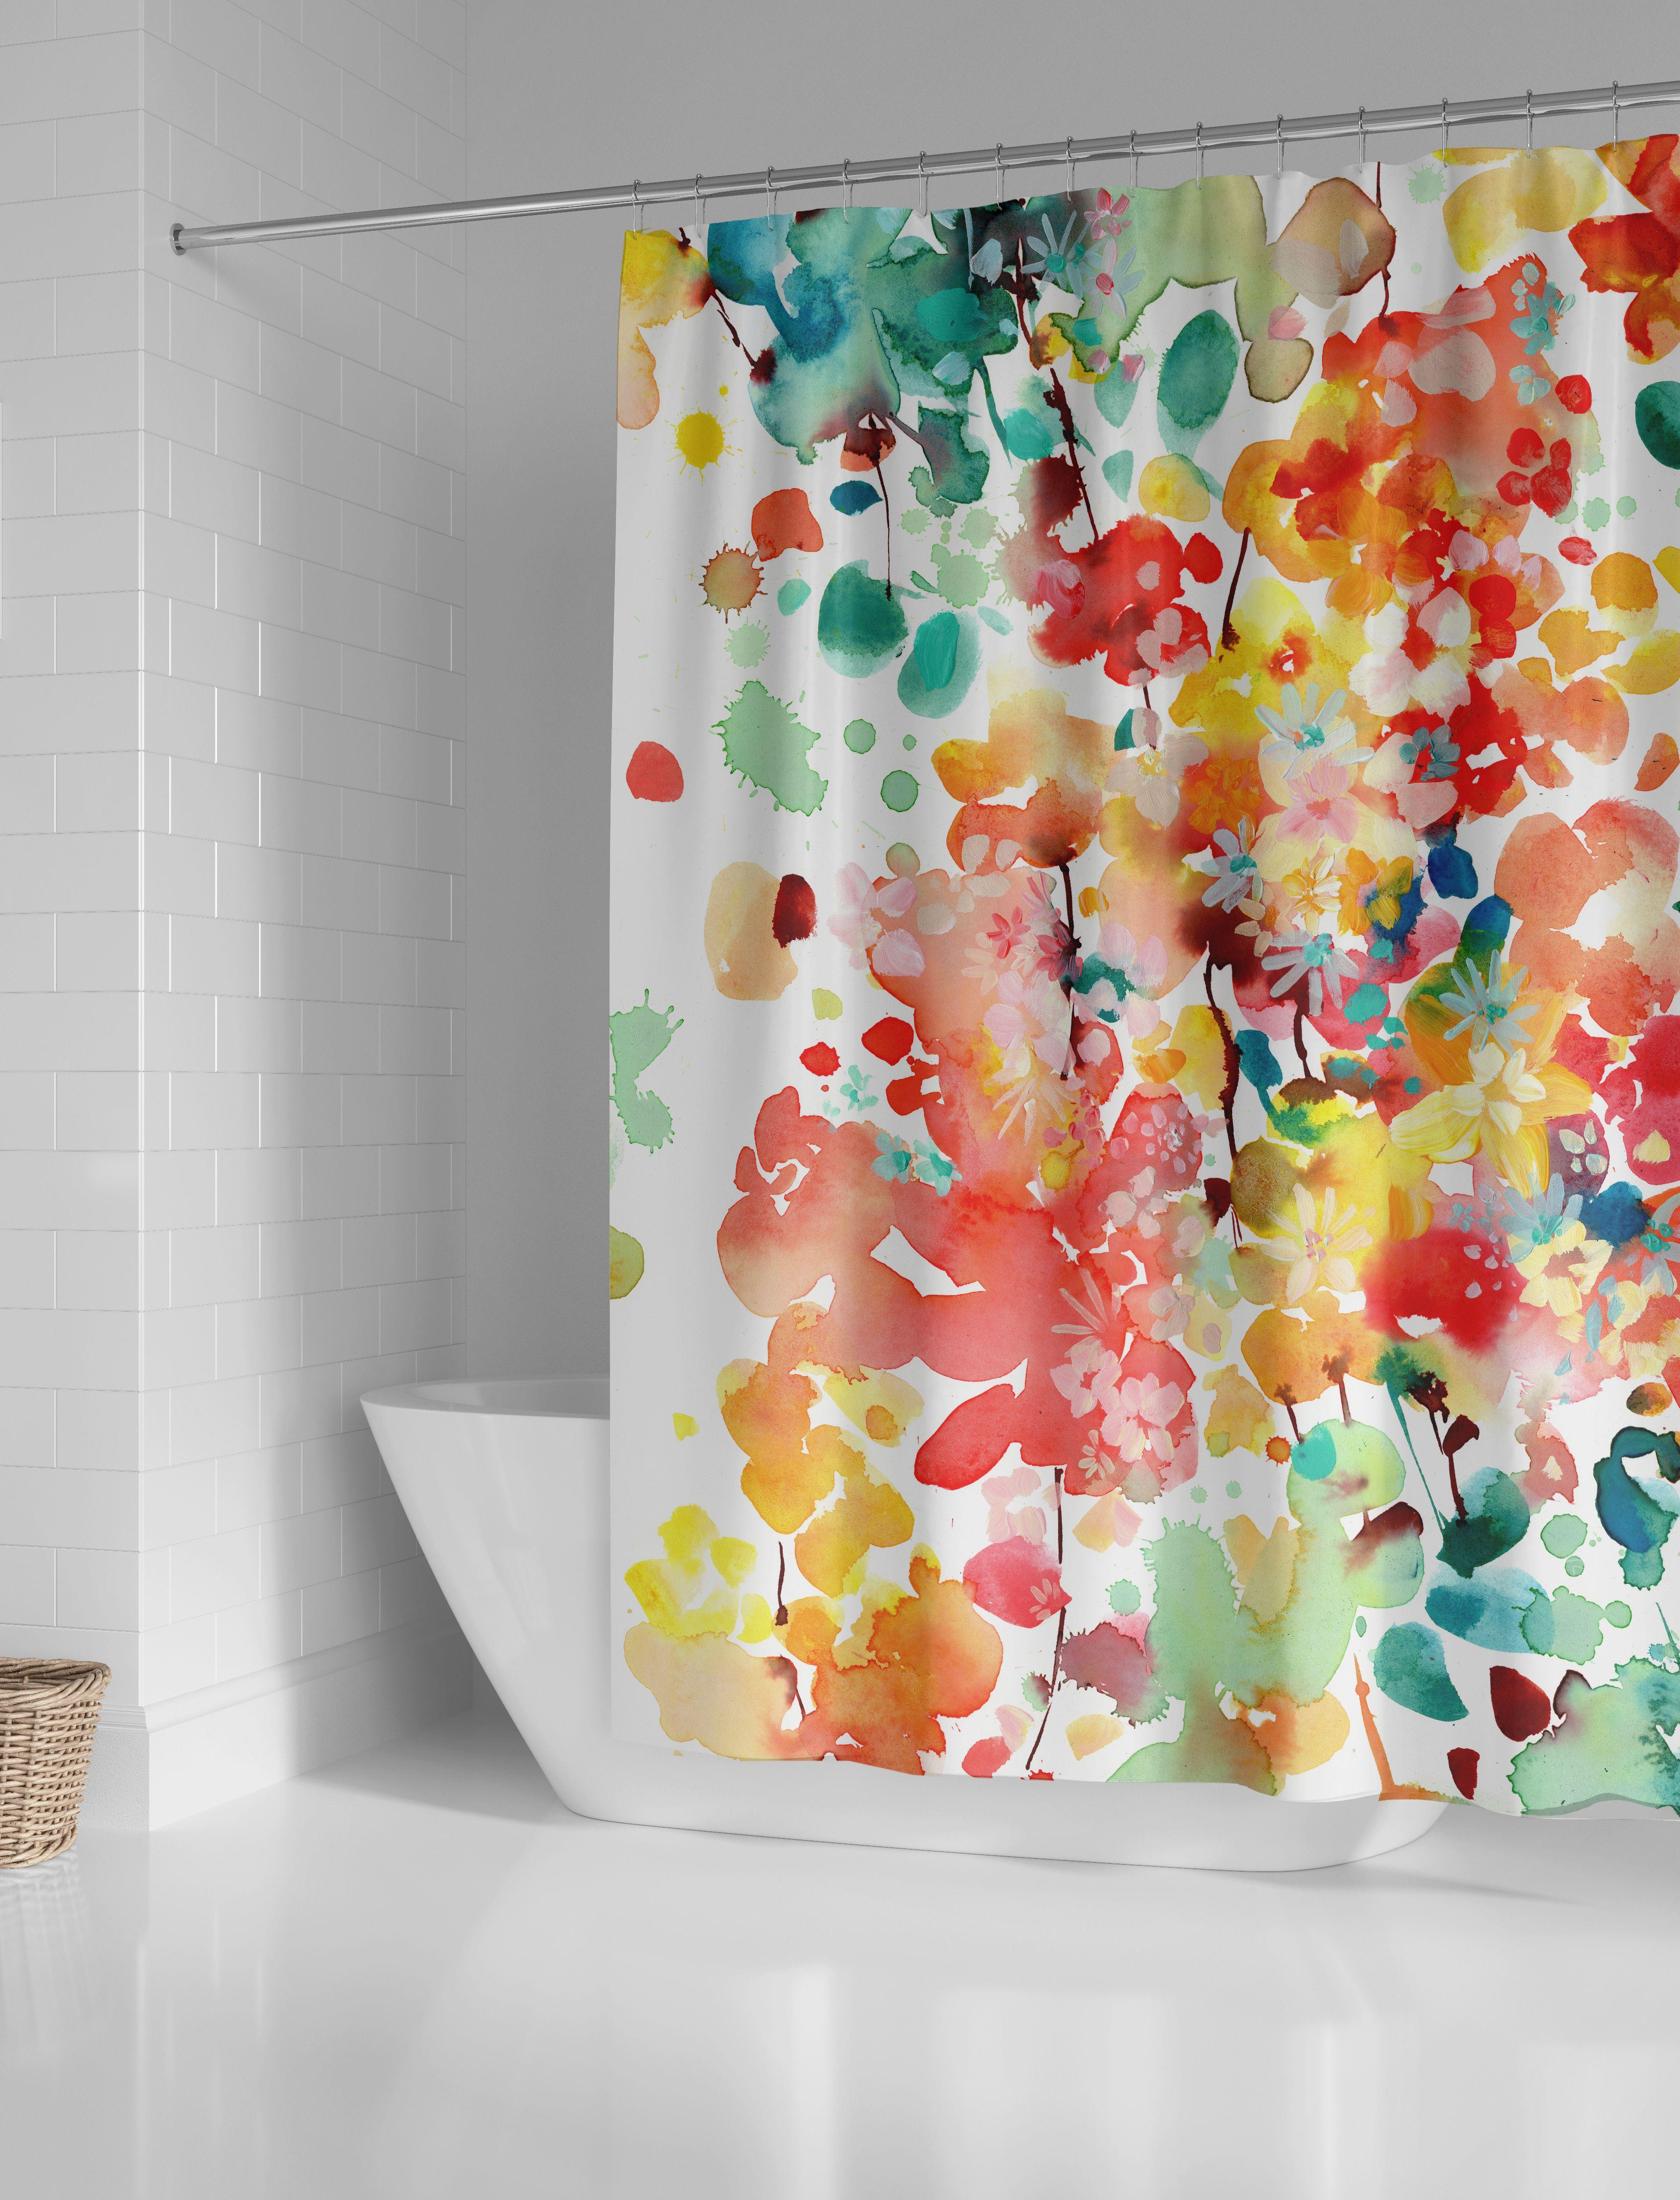 Thrive Shower Curtain Curtains Boho Bathroom Shower Curtain